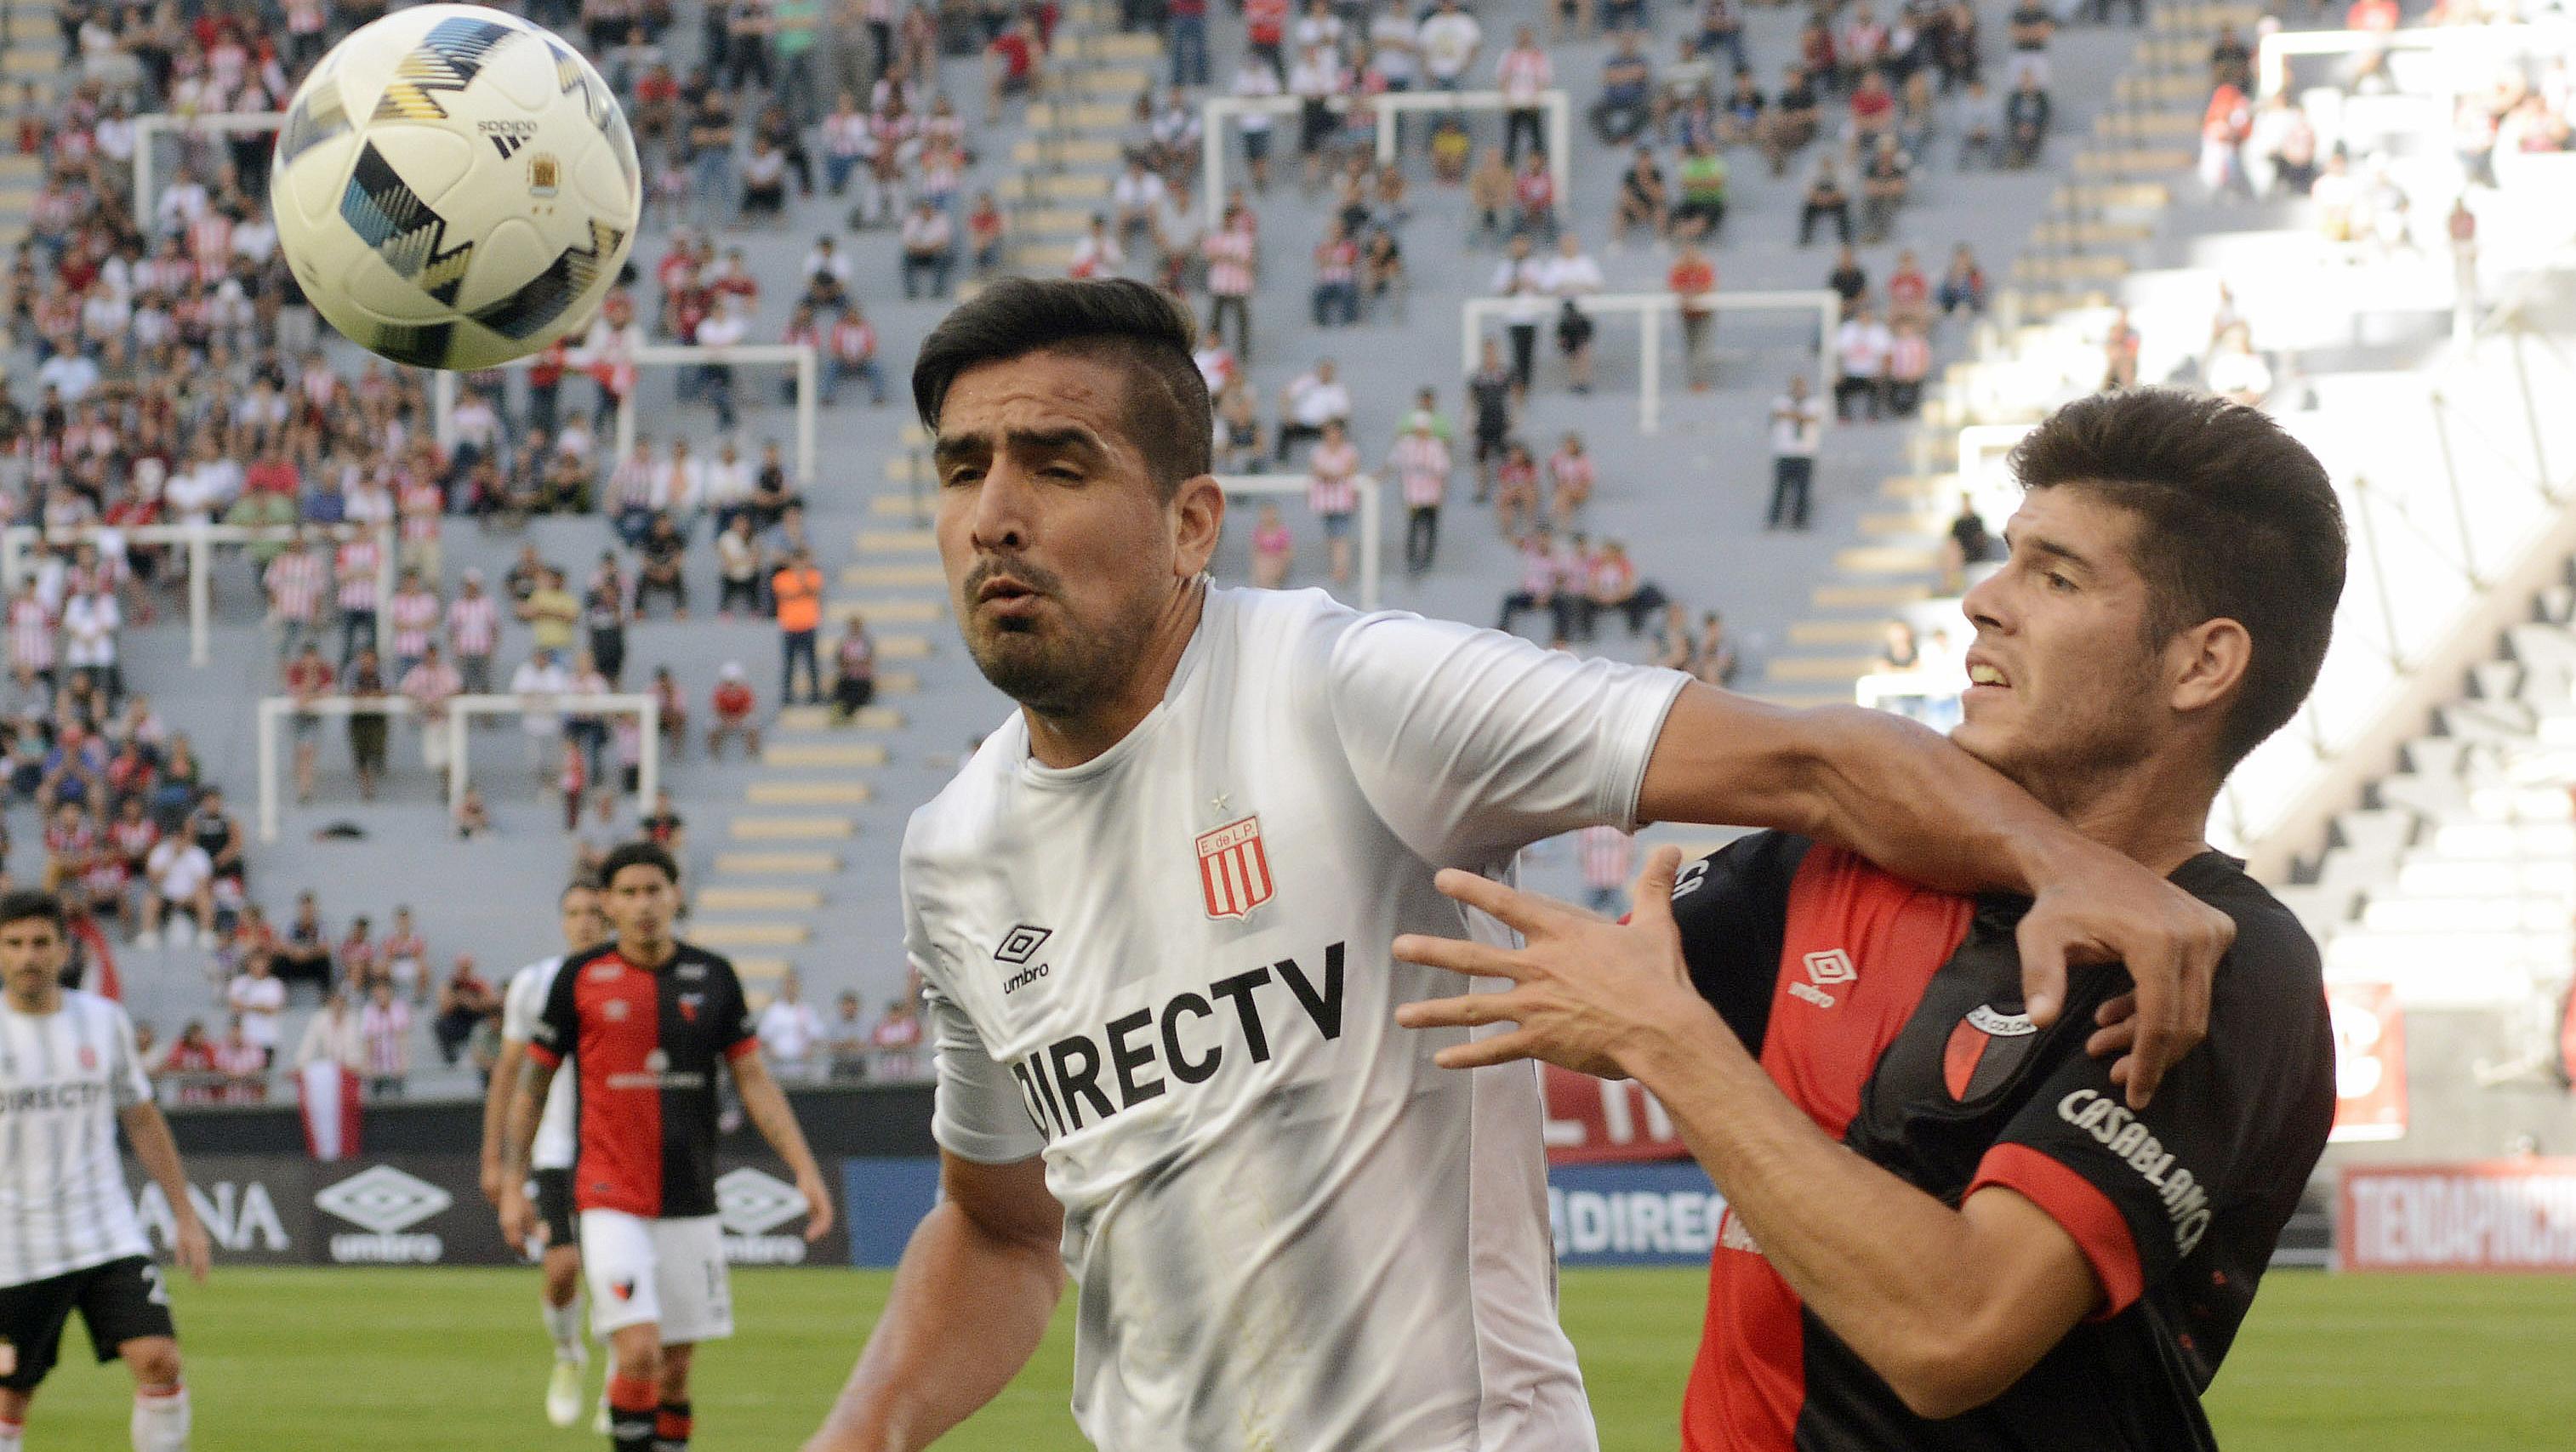 El único gol del encuentro lo anotó el ex Boca, Lucas Viatri. (Foto: Télam)